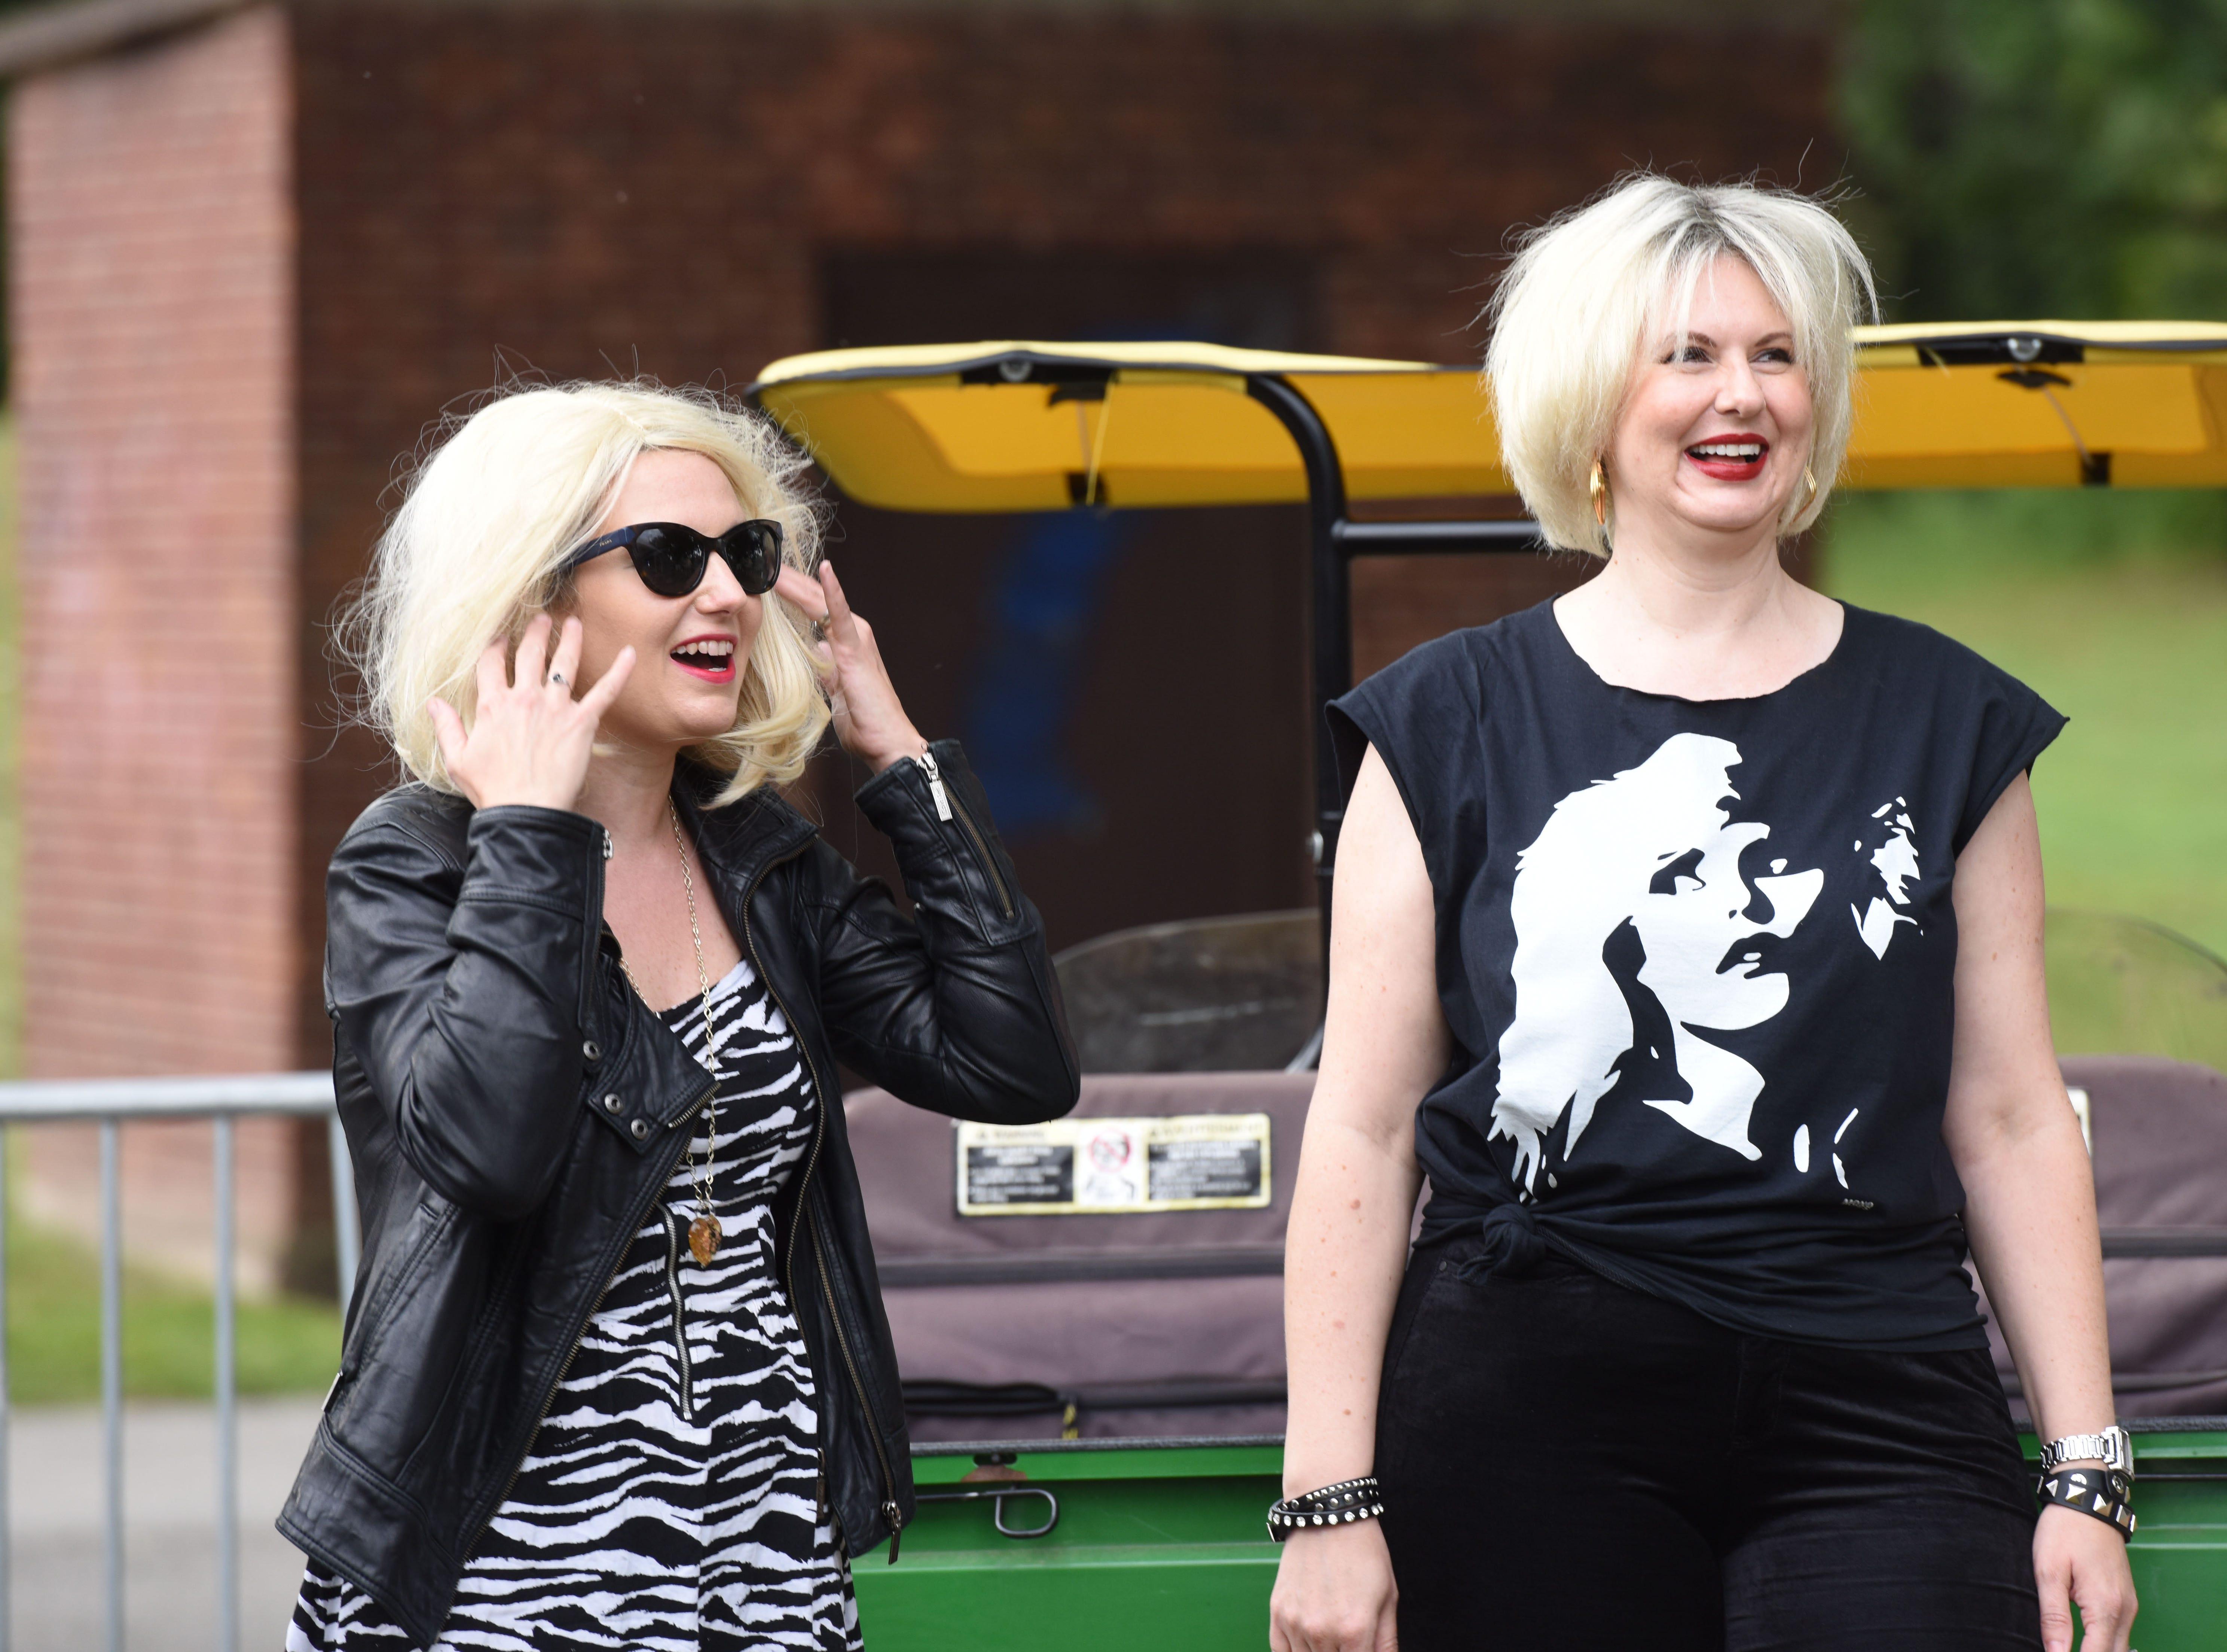 the two Blondie Lookalike contestants Adrienne Girard and Amber MackeyHawthorne Day -Blondie Lookalike